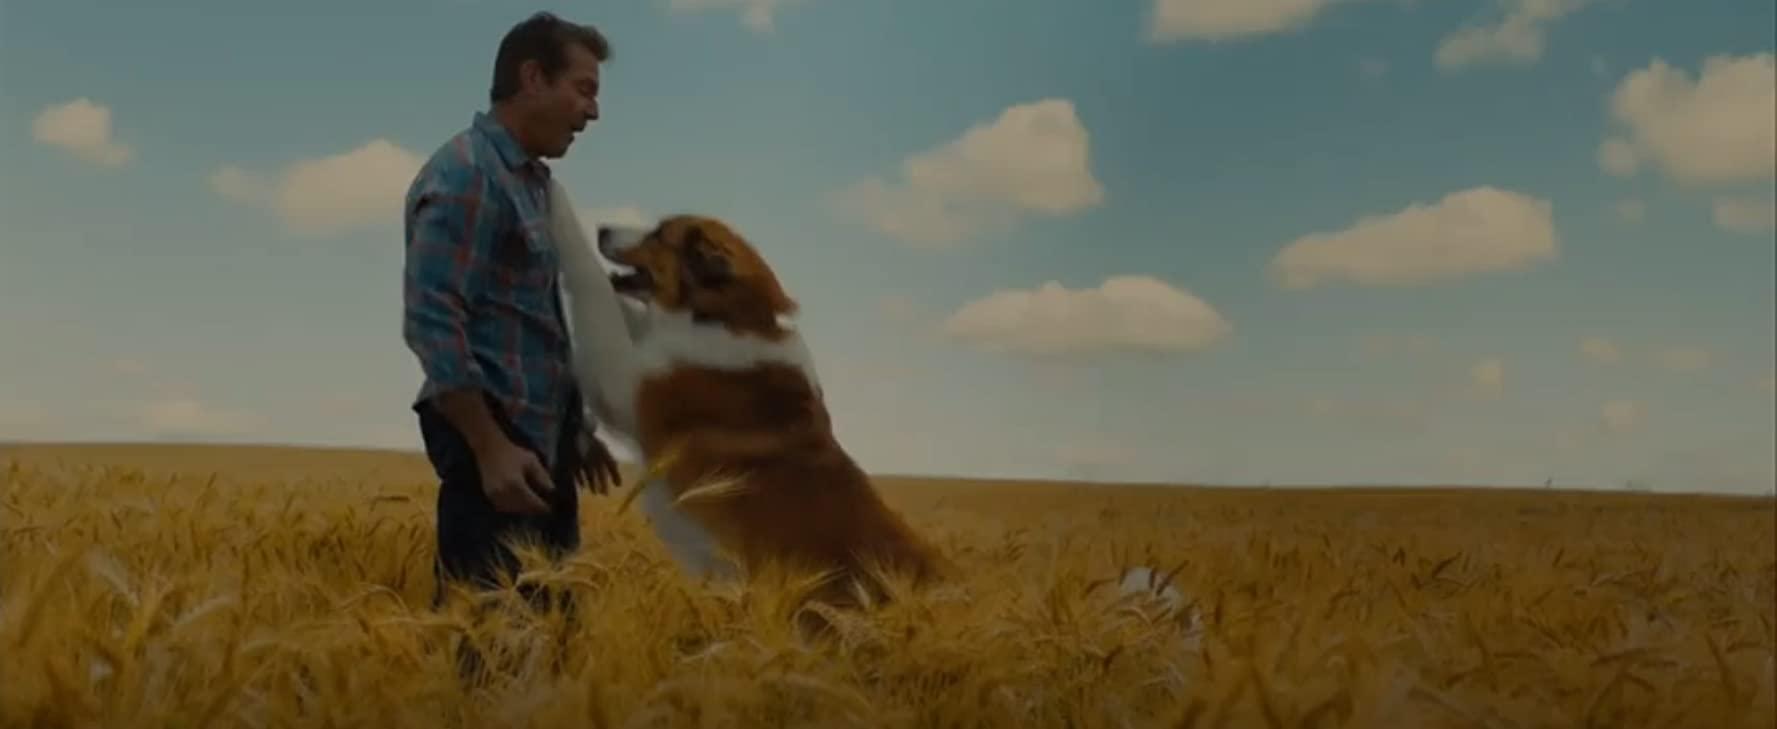 مشاهدة فيلم A Dogs Journey (2019) مترجم HD اون لاين